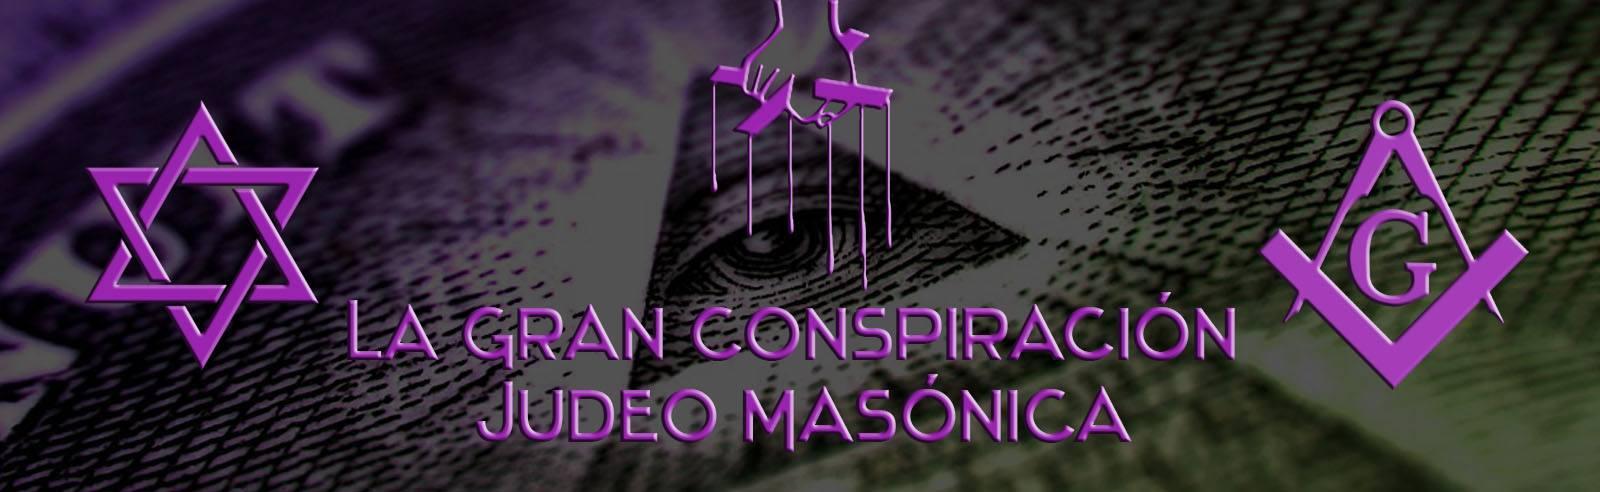 la-gran-conspiracion-judeo-masonica